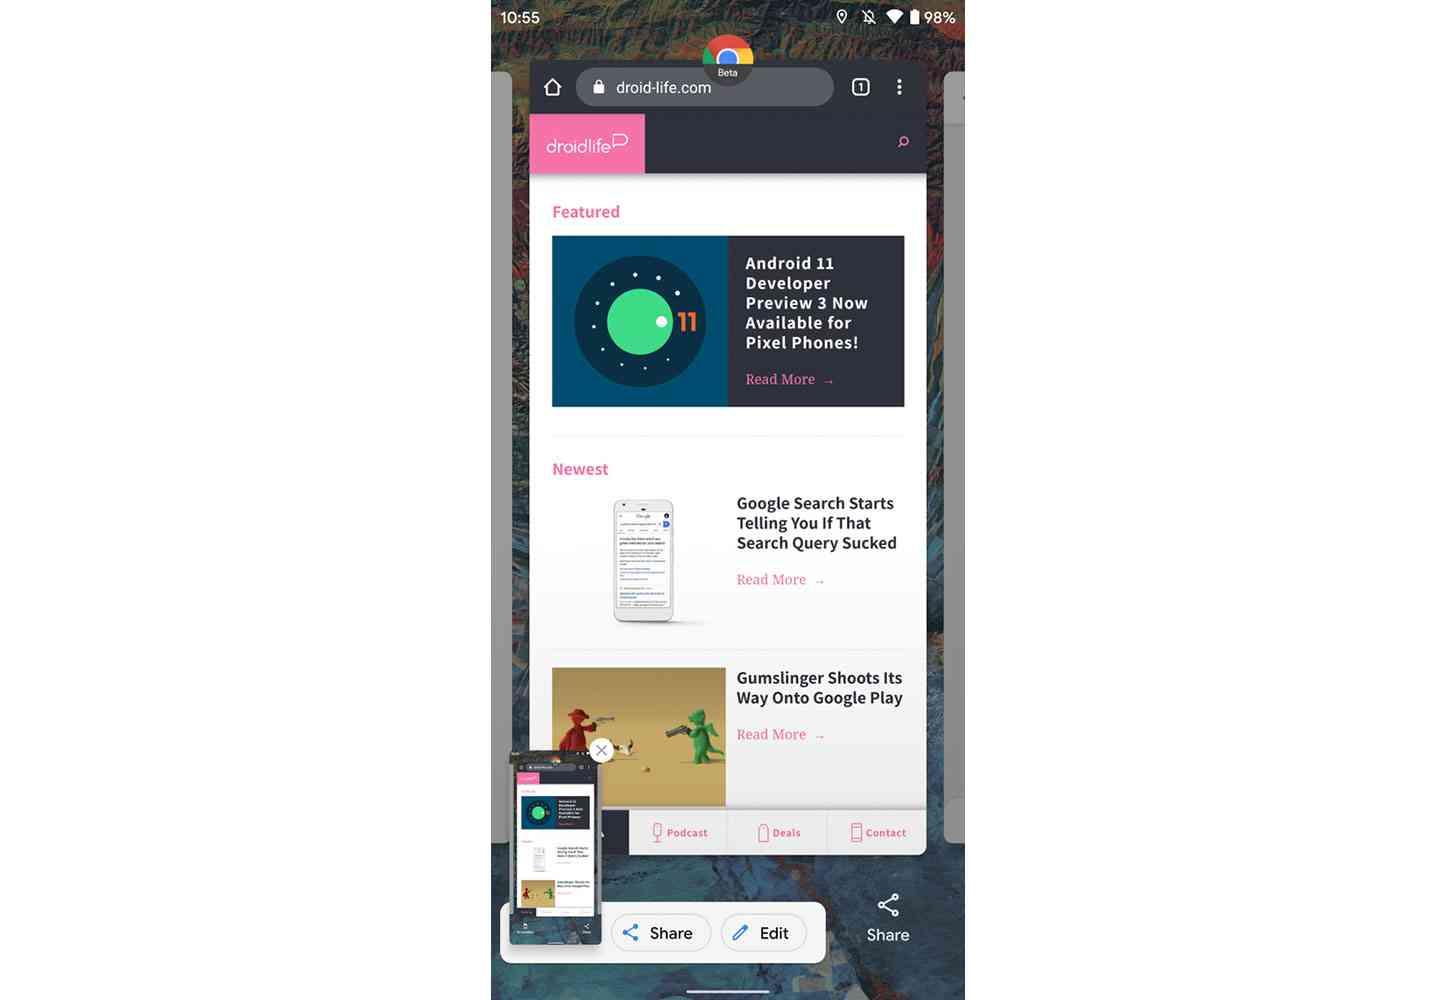 Android 11 new screenshot UI